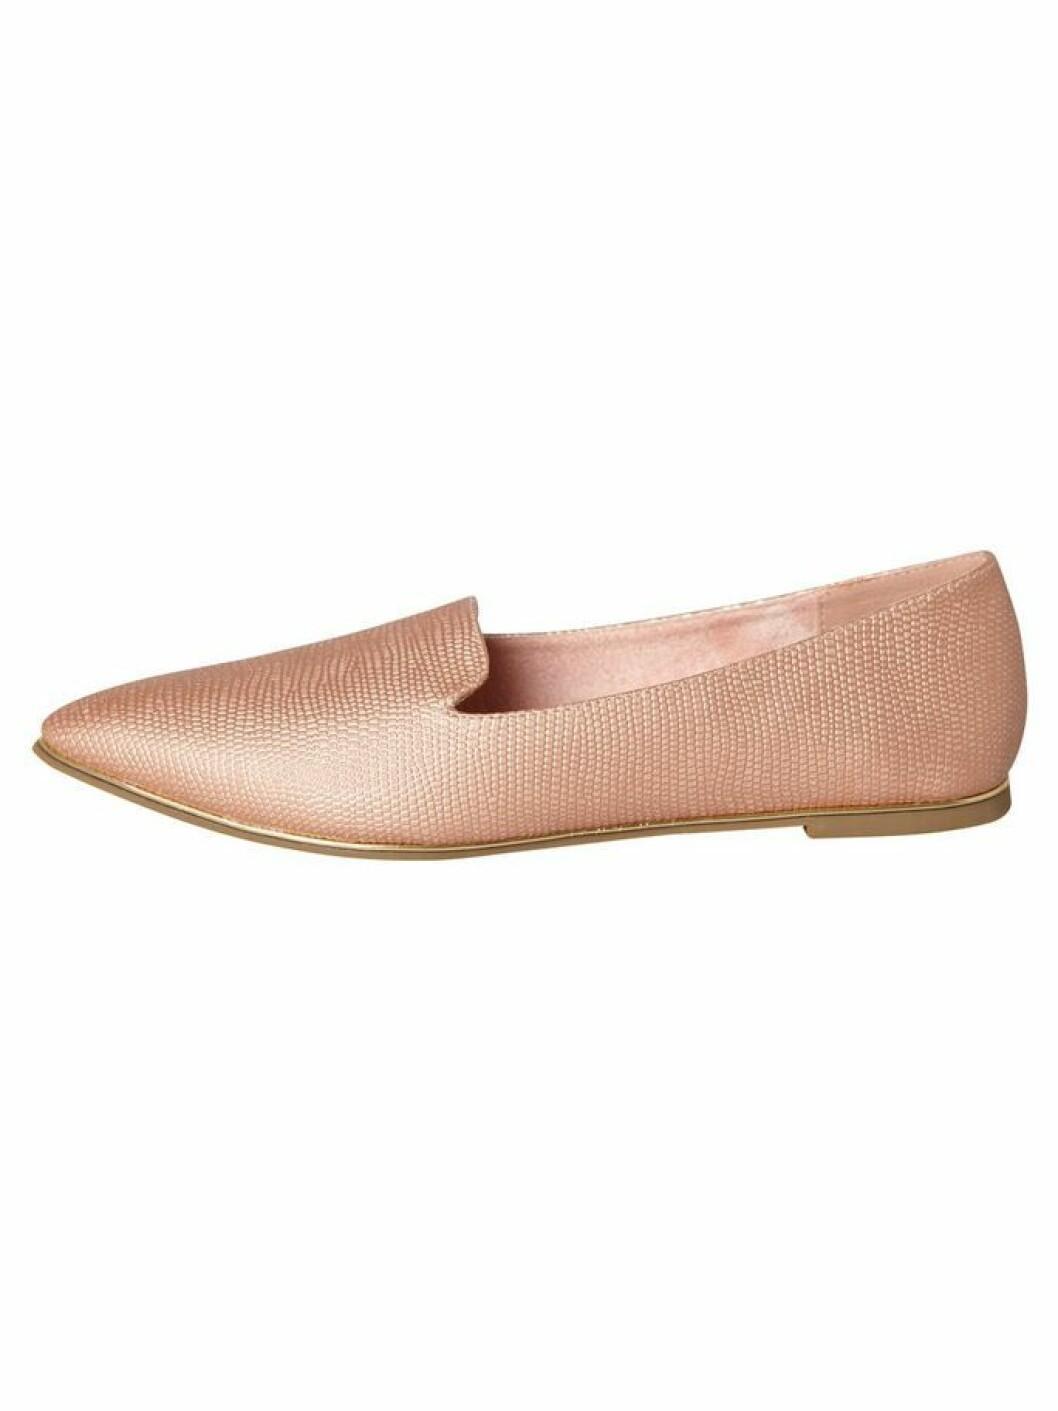 Ljusrosa loafer